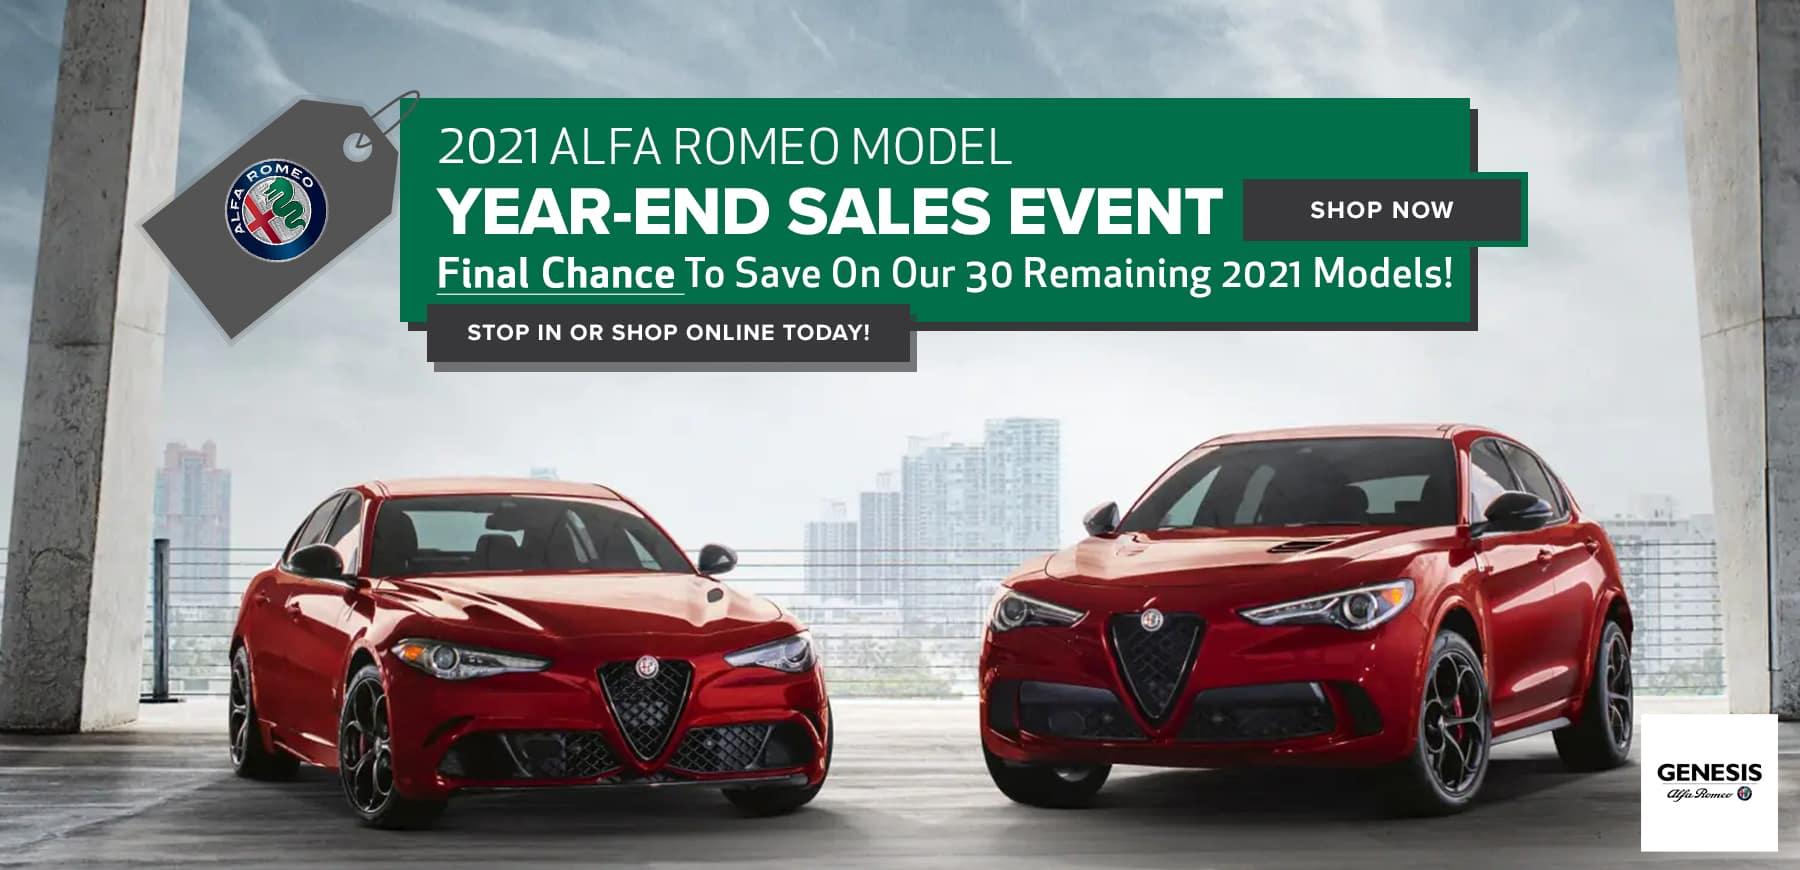 Alt Text: 2021 Genesis Alfa Romeo Clearance Event